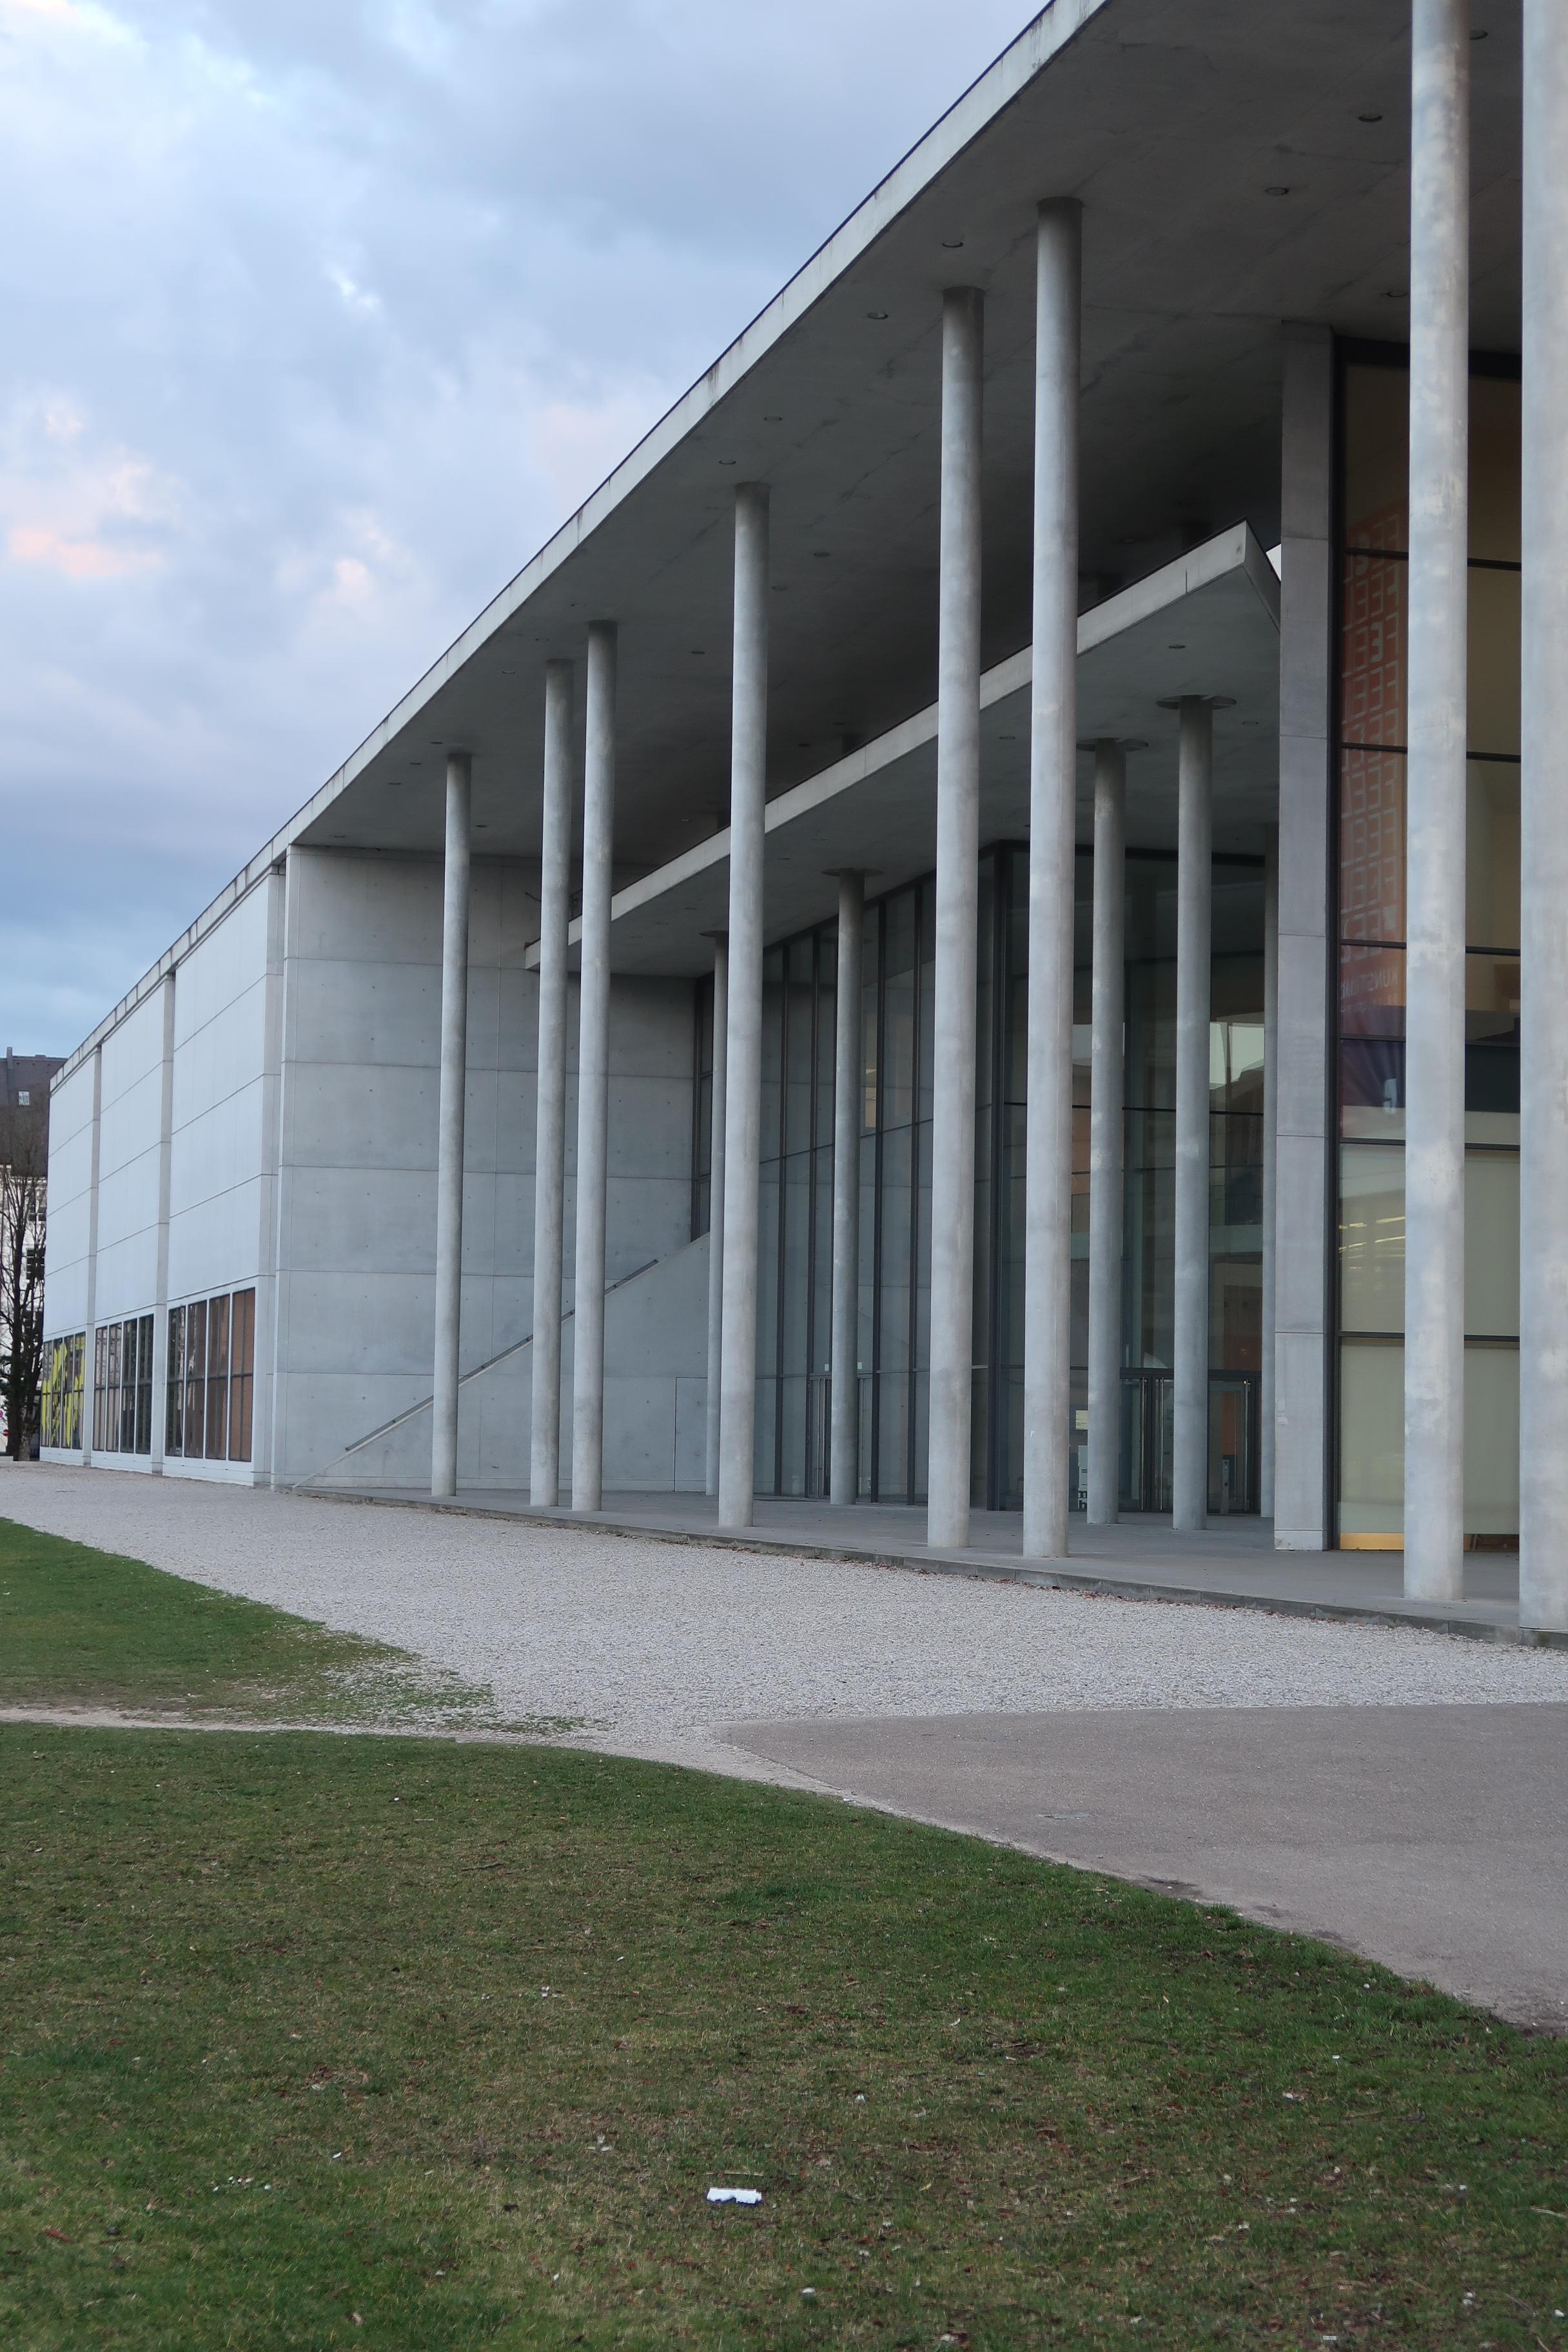 Die Neue Sammlung, gevel, München, 12 maart 2020. Foto Coert Peter Krabbe, entree